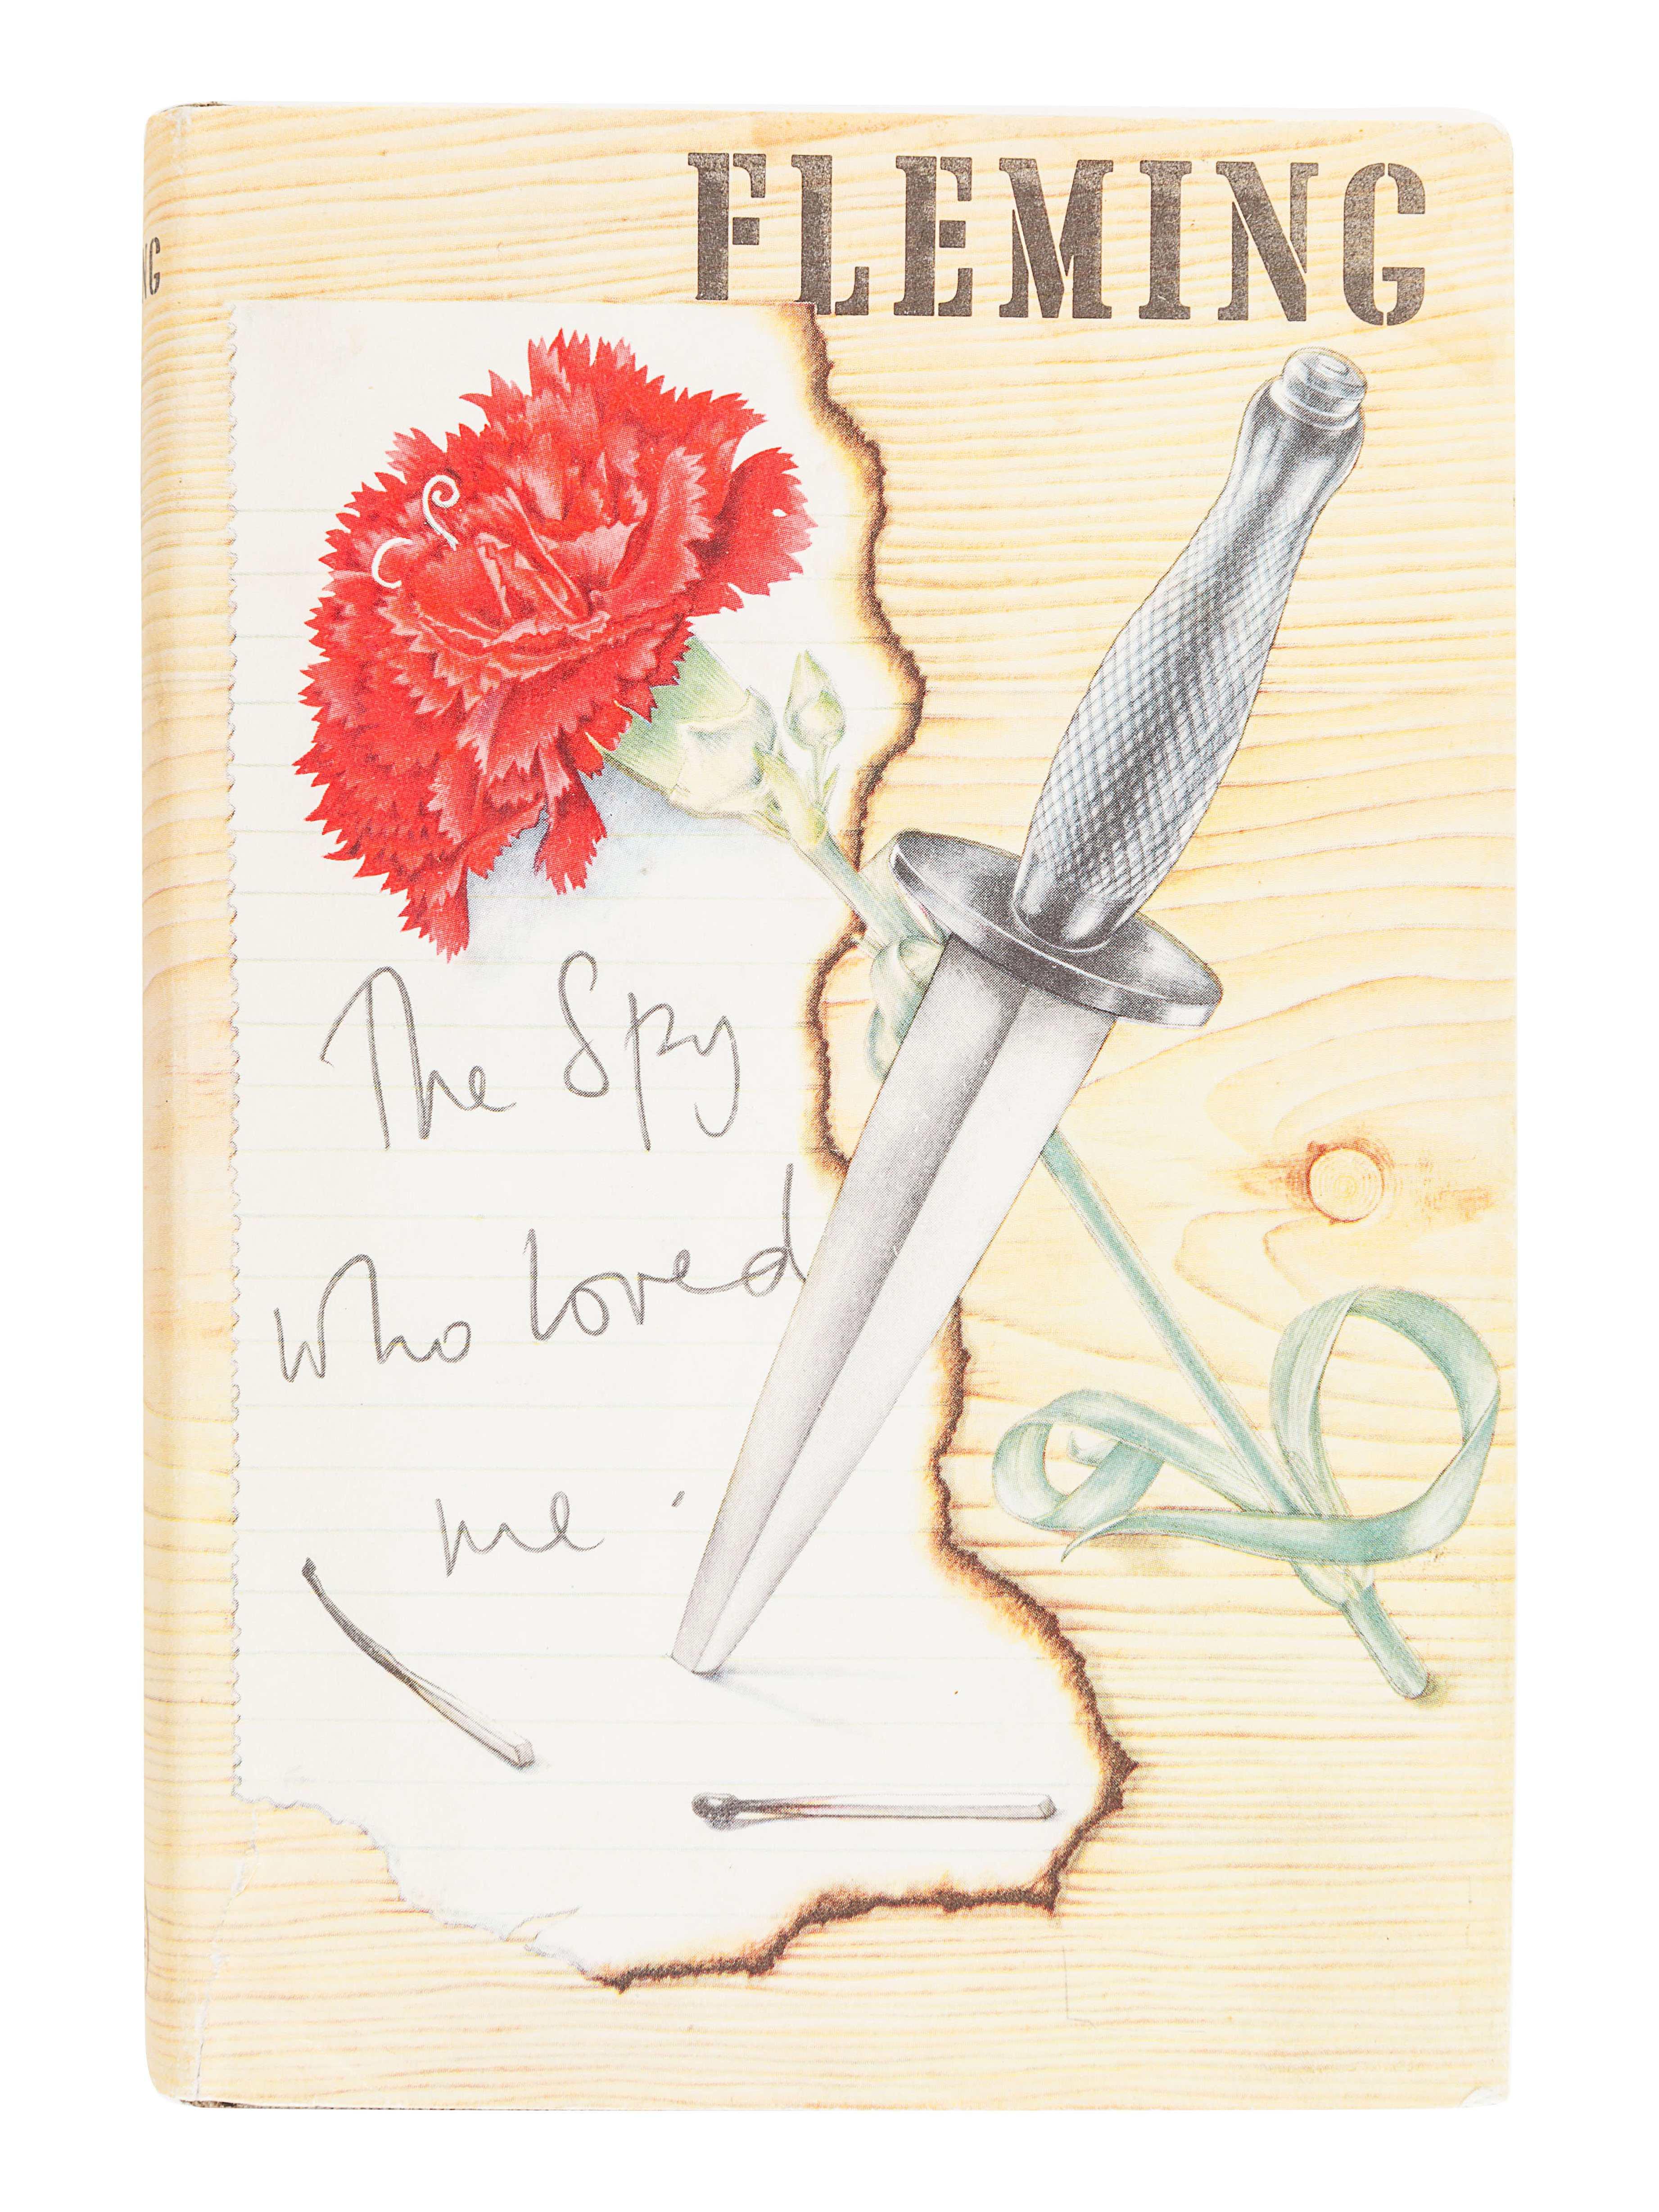 FLEMING, Ian (1908-1964). The Spy Who Loved Me. London: Jonathan Cape, 1962.